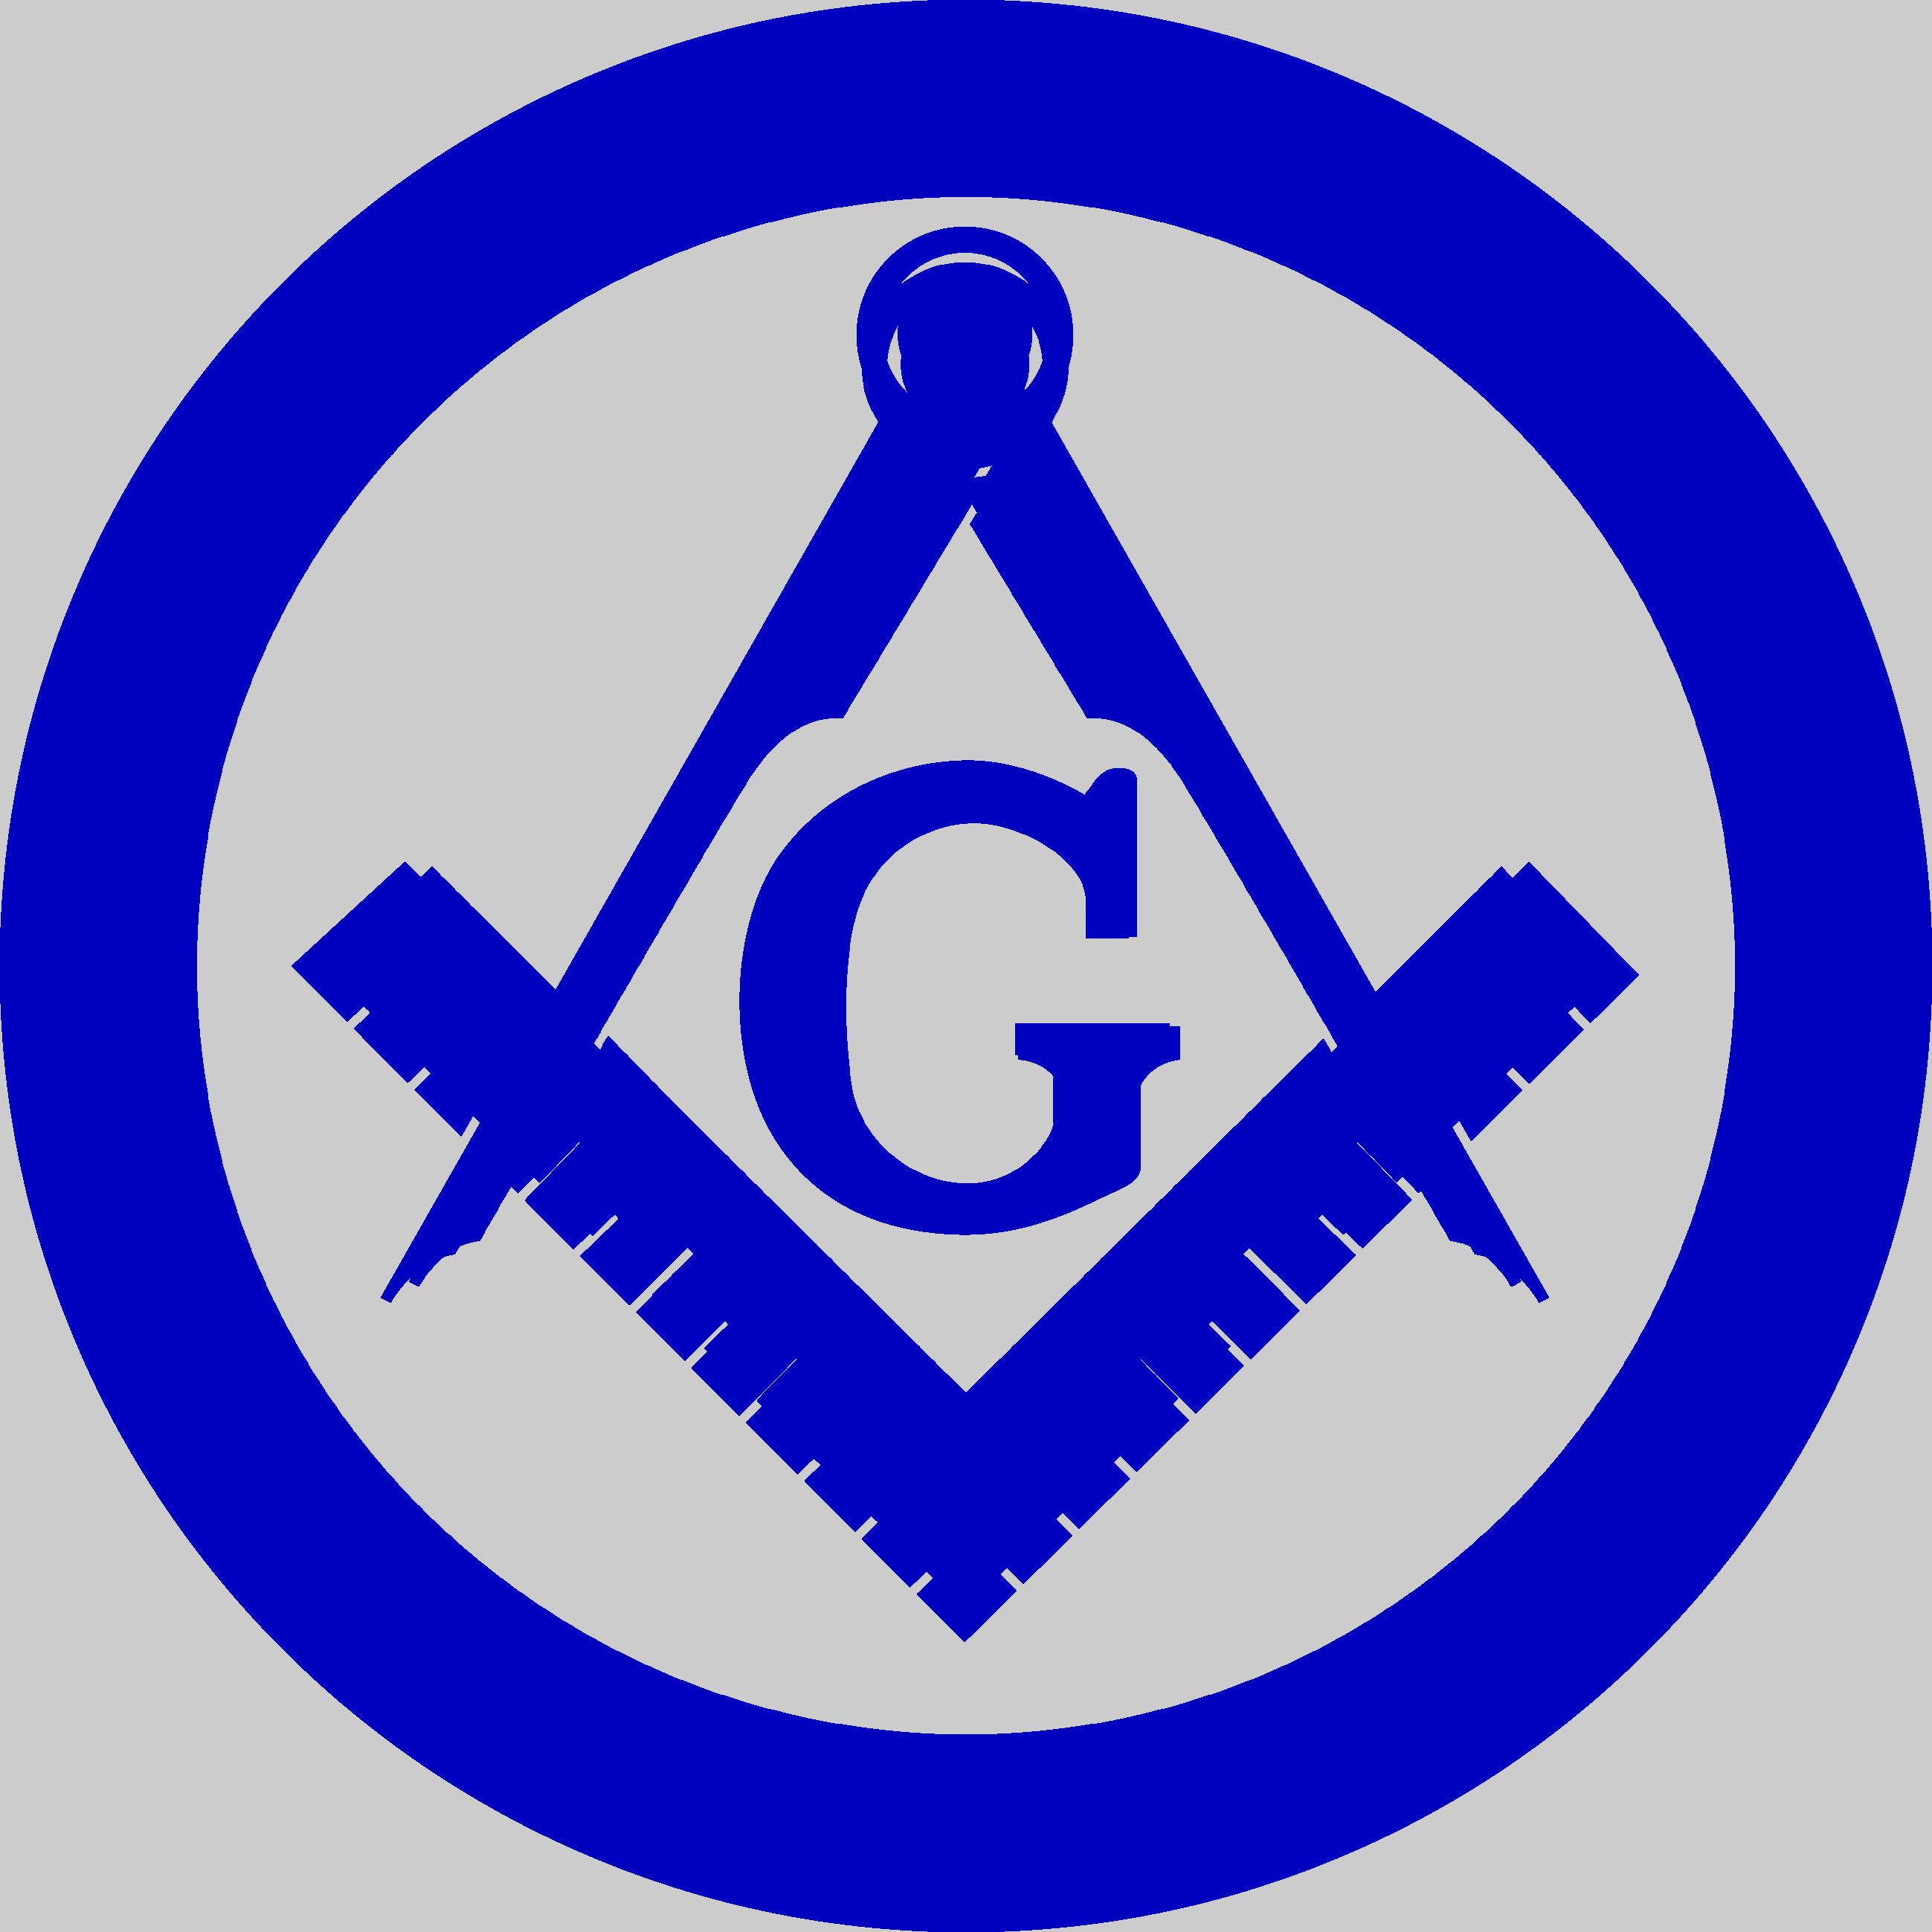 svg black and white stock Mason clipart square compass. Free masonic emblems logos.